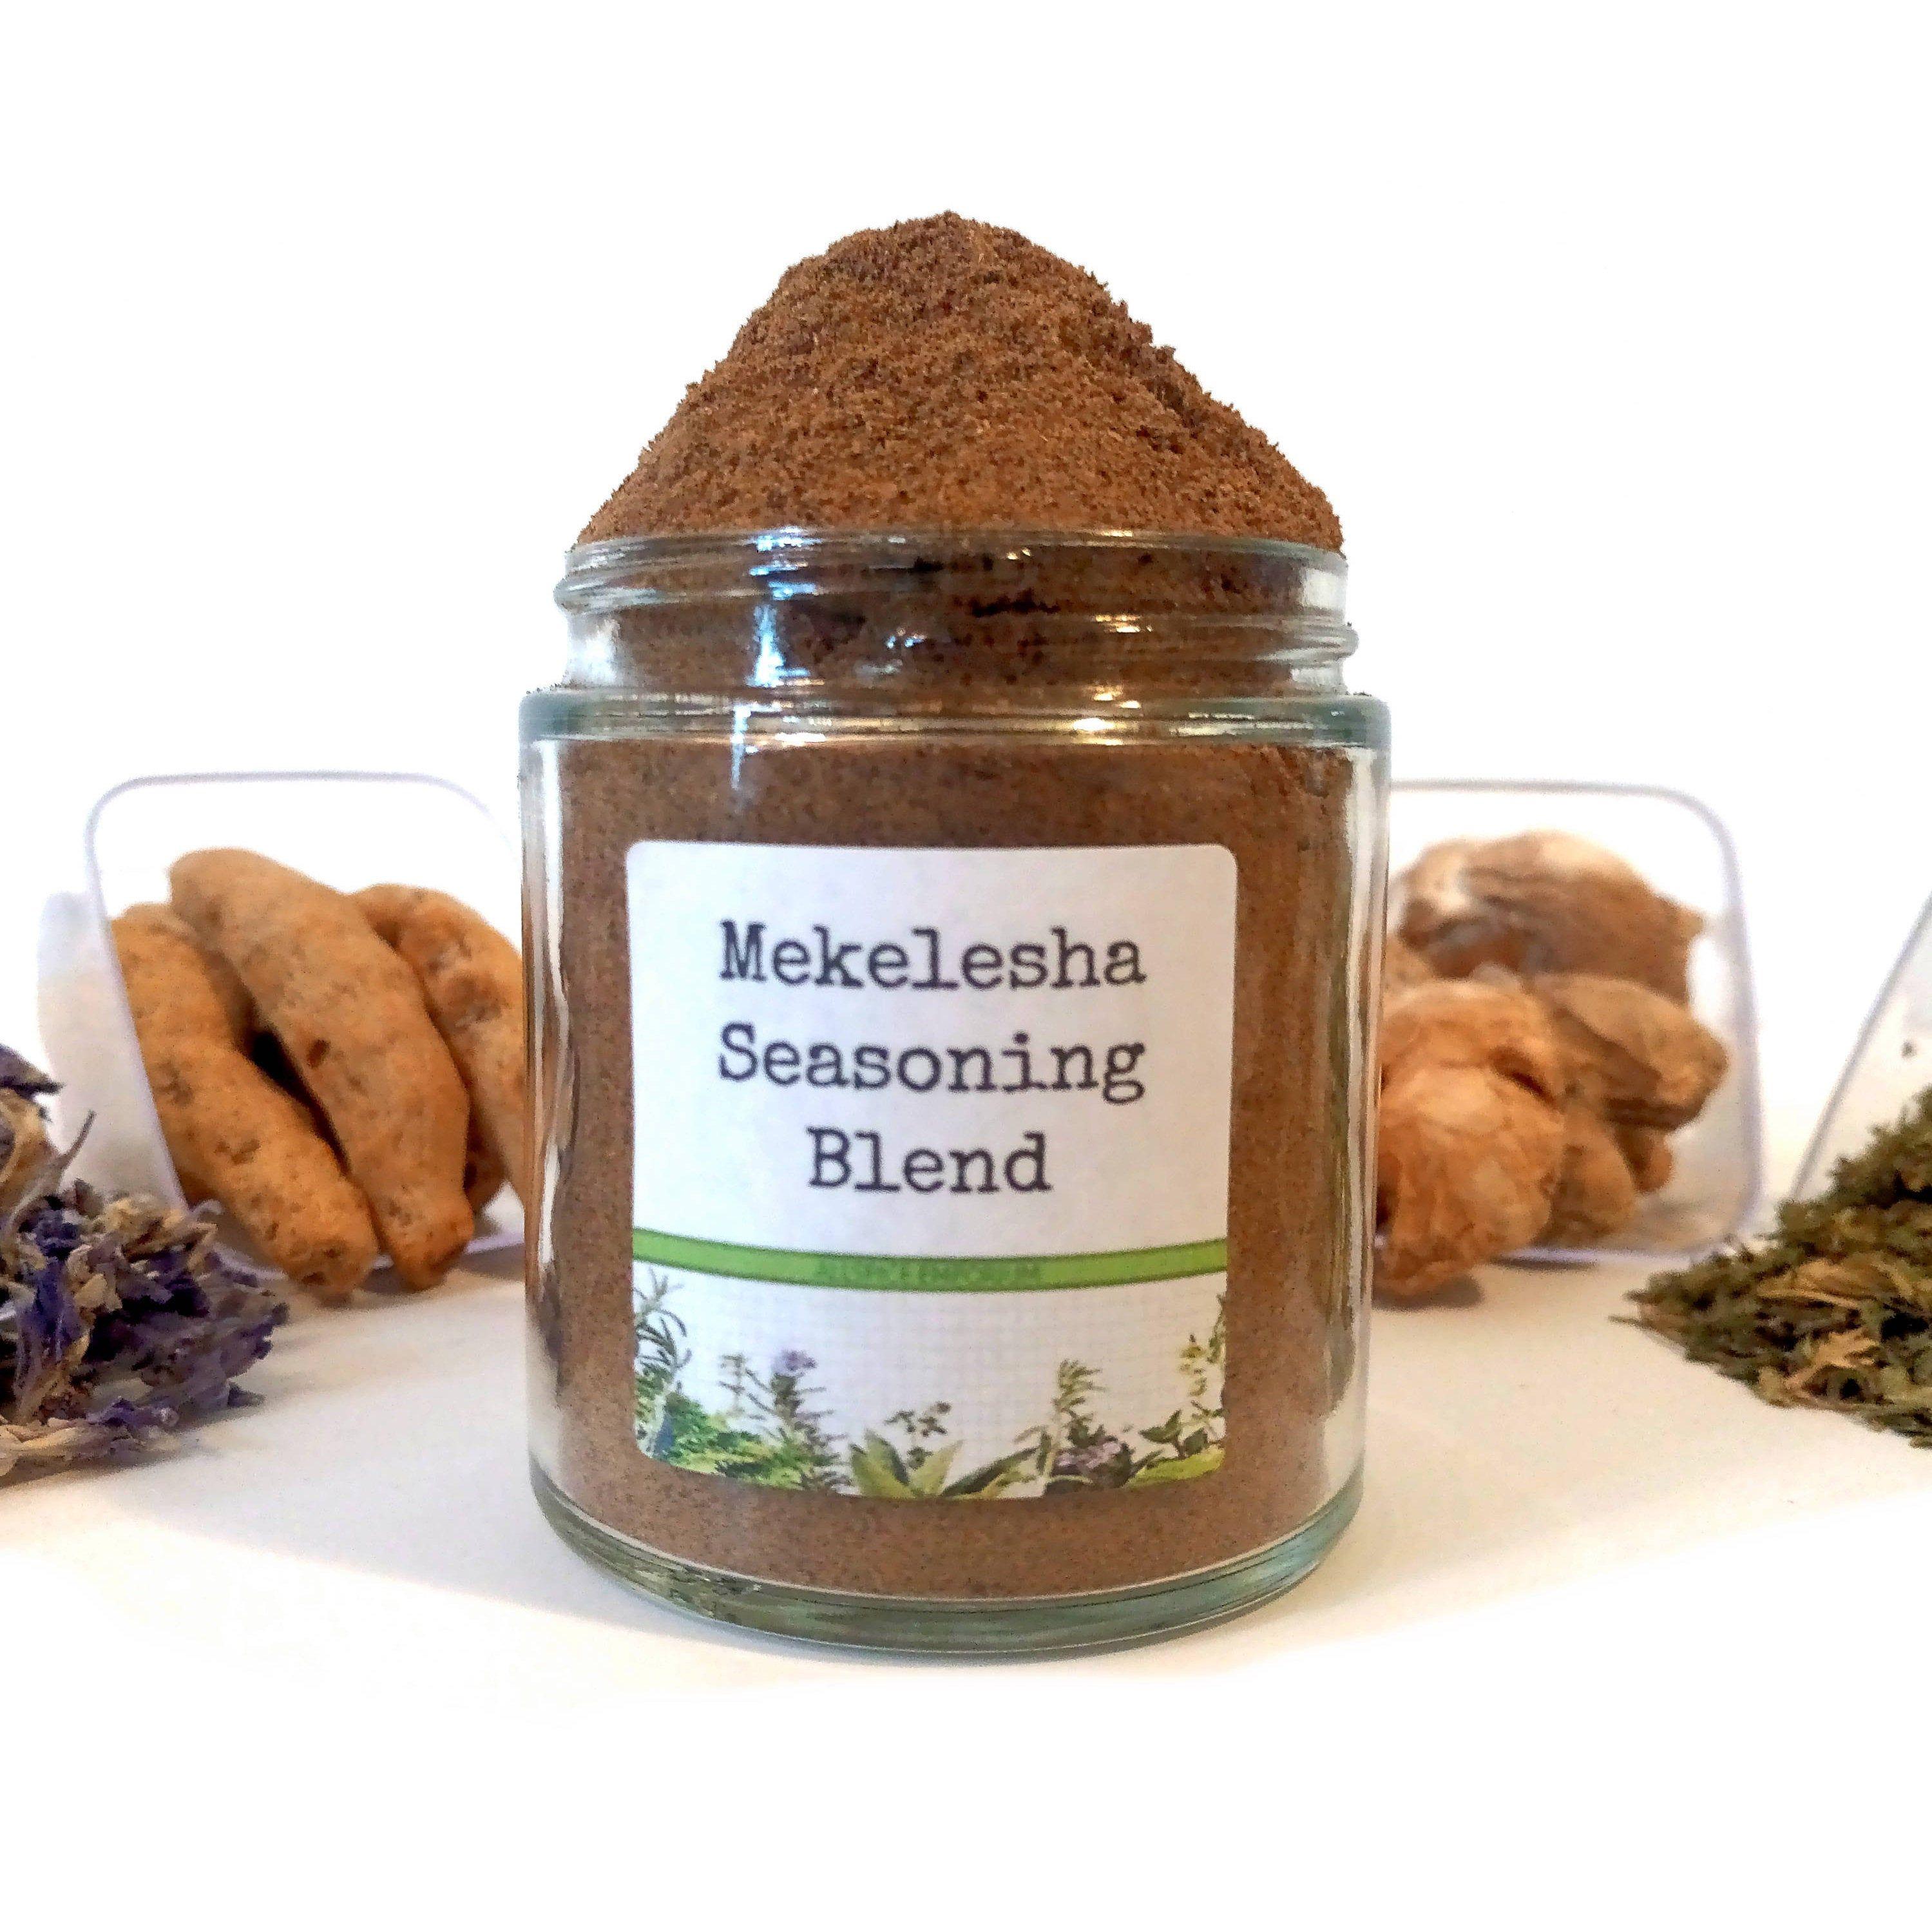 Mekelesha Seasoning Blend Wot Kimem Gourmet Spices Gluten Free